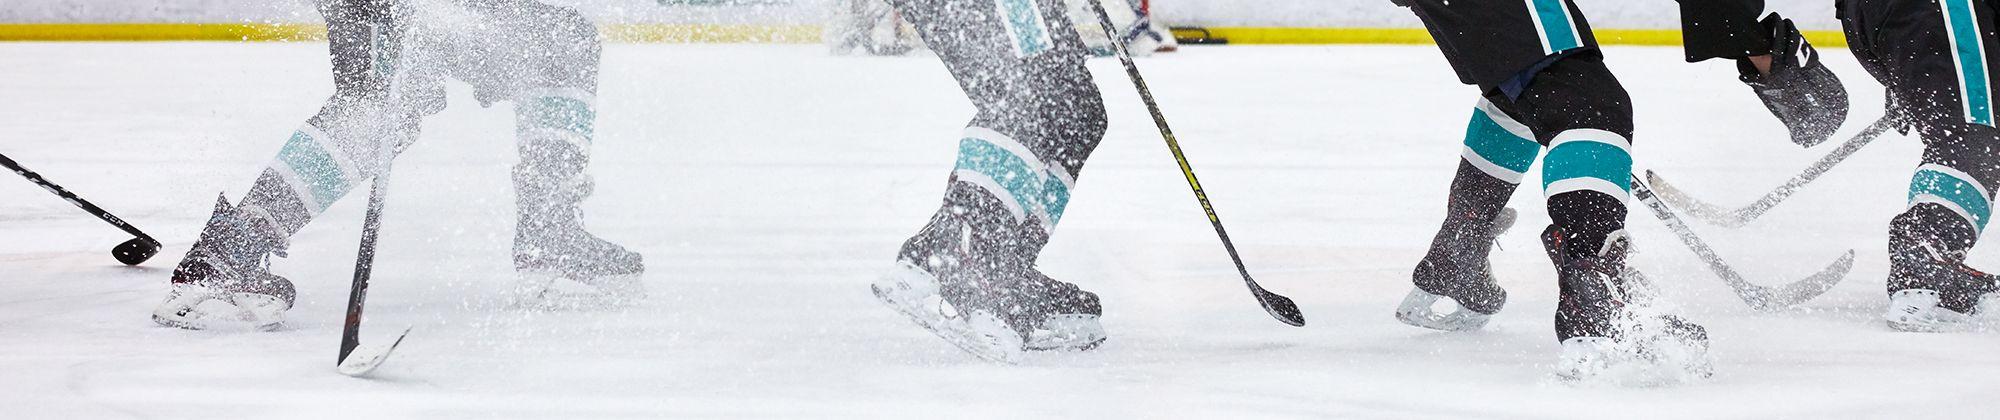 Image result for banner picture of skates